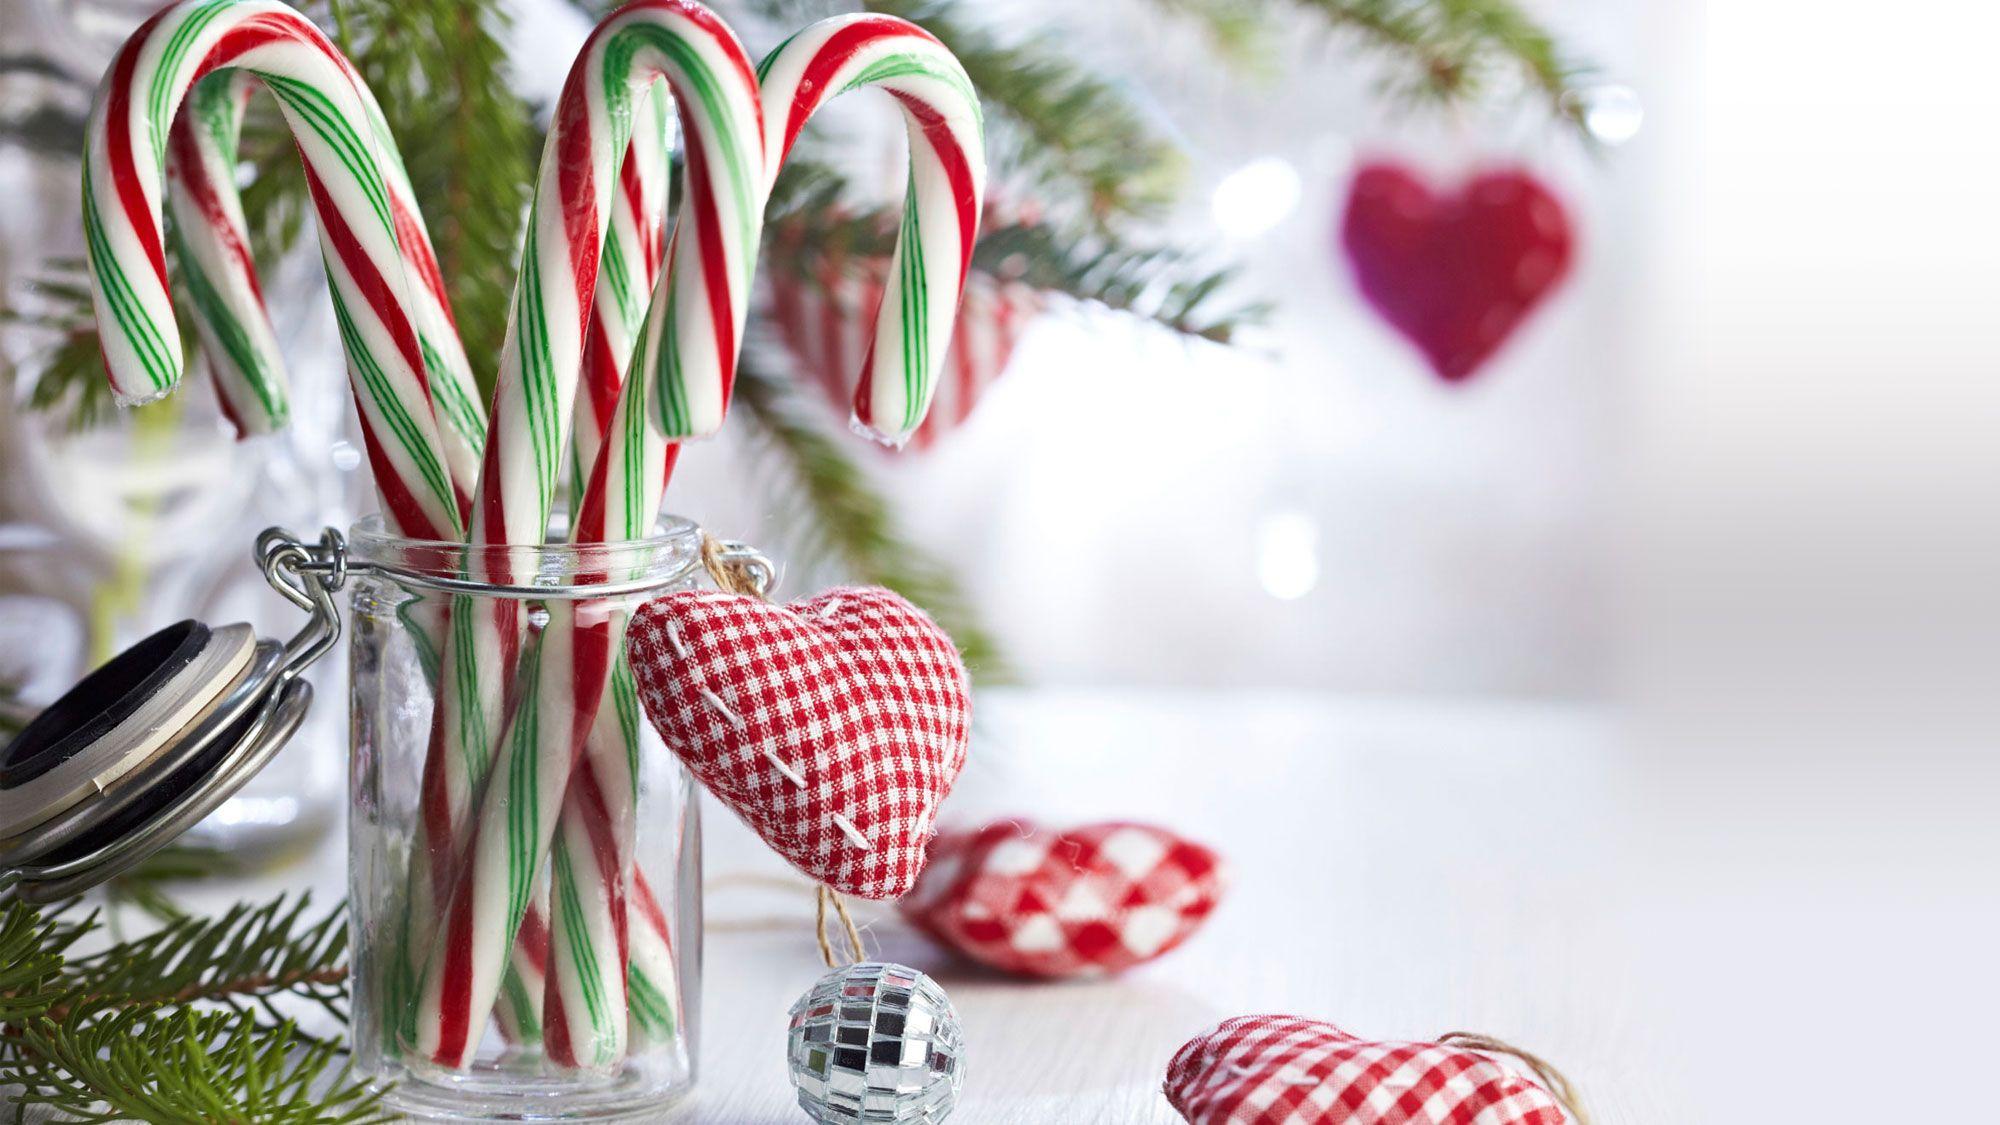 tarros cristal navidad